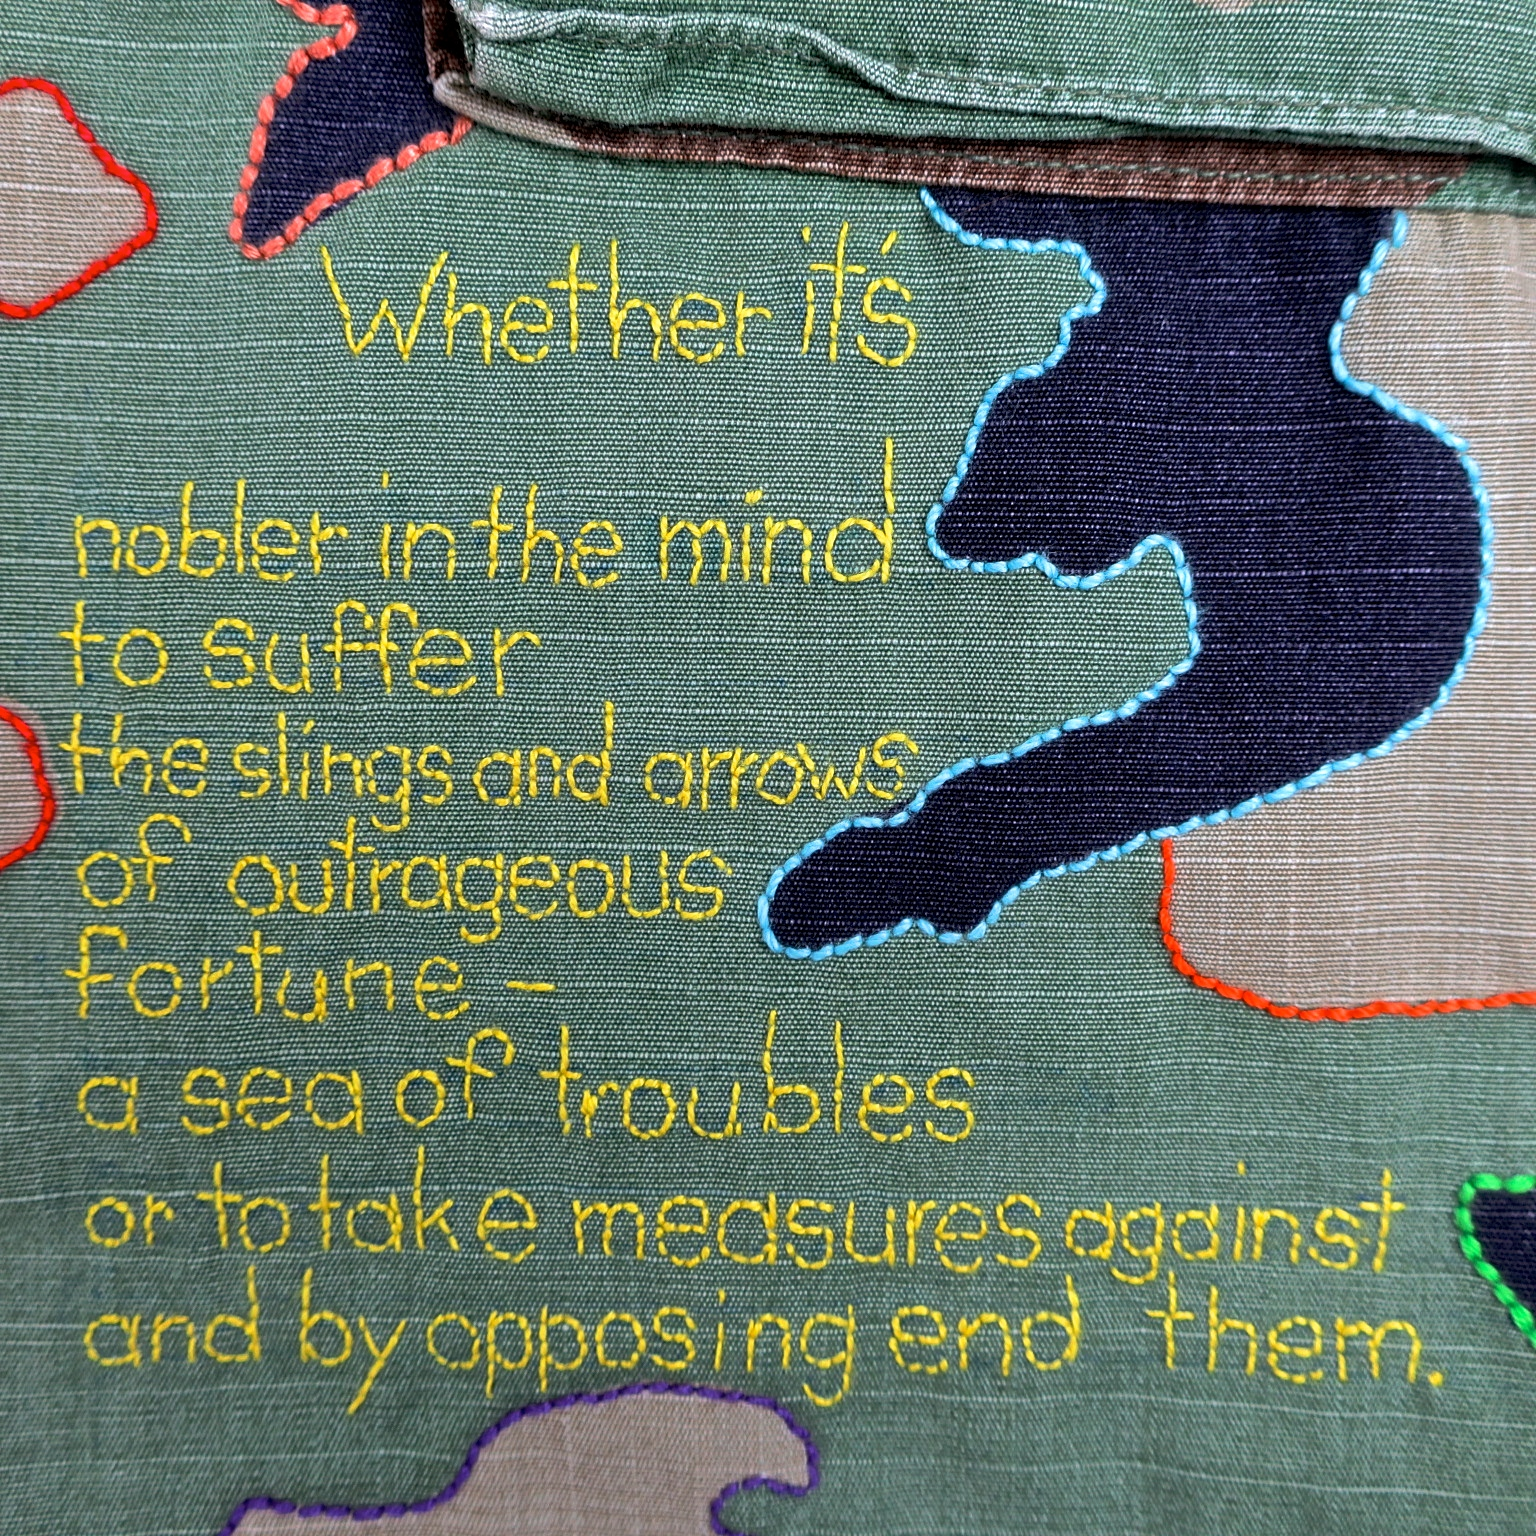 hamlet biene bee camouflage camo camu statement fairfashion slowfashion ethicalfashion anstand shakespeare kampfuniform ecofriendly dignity humanism handgestickt embroidery stitching